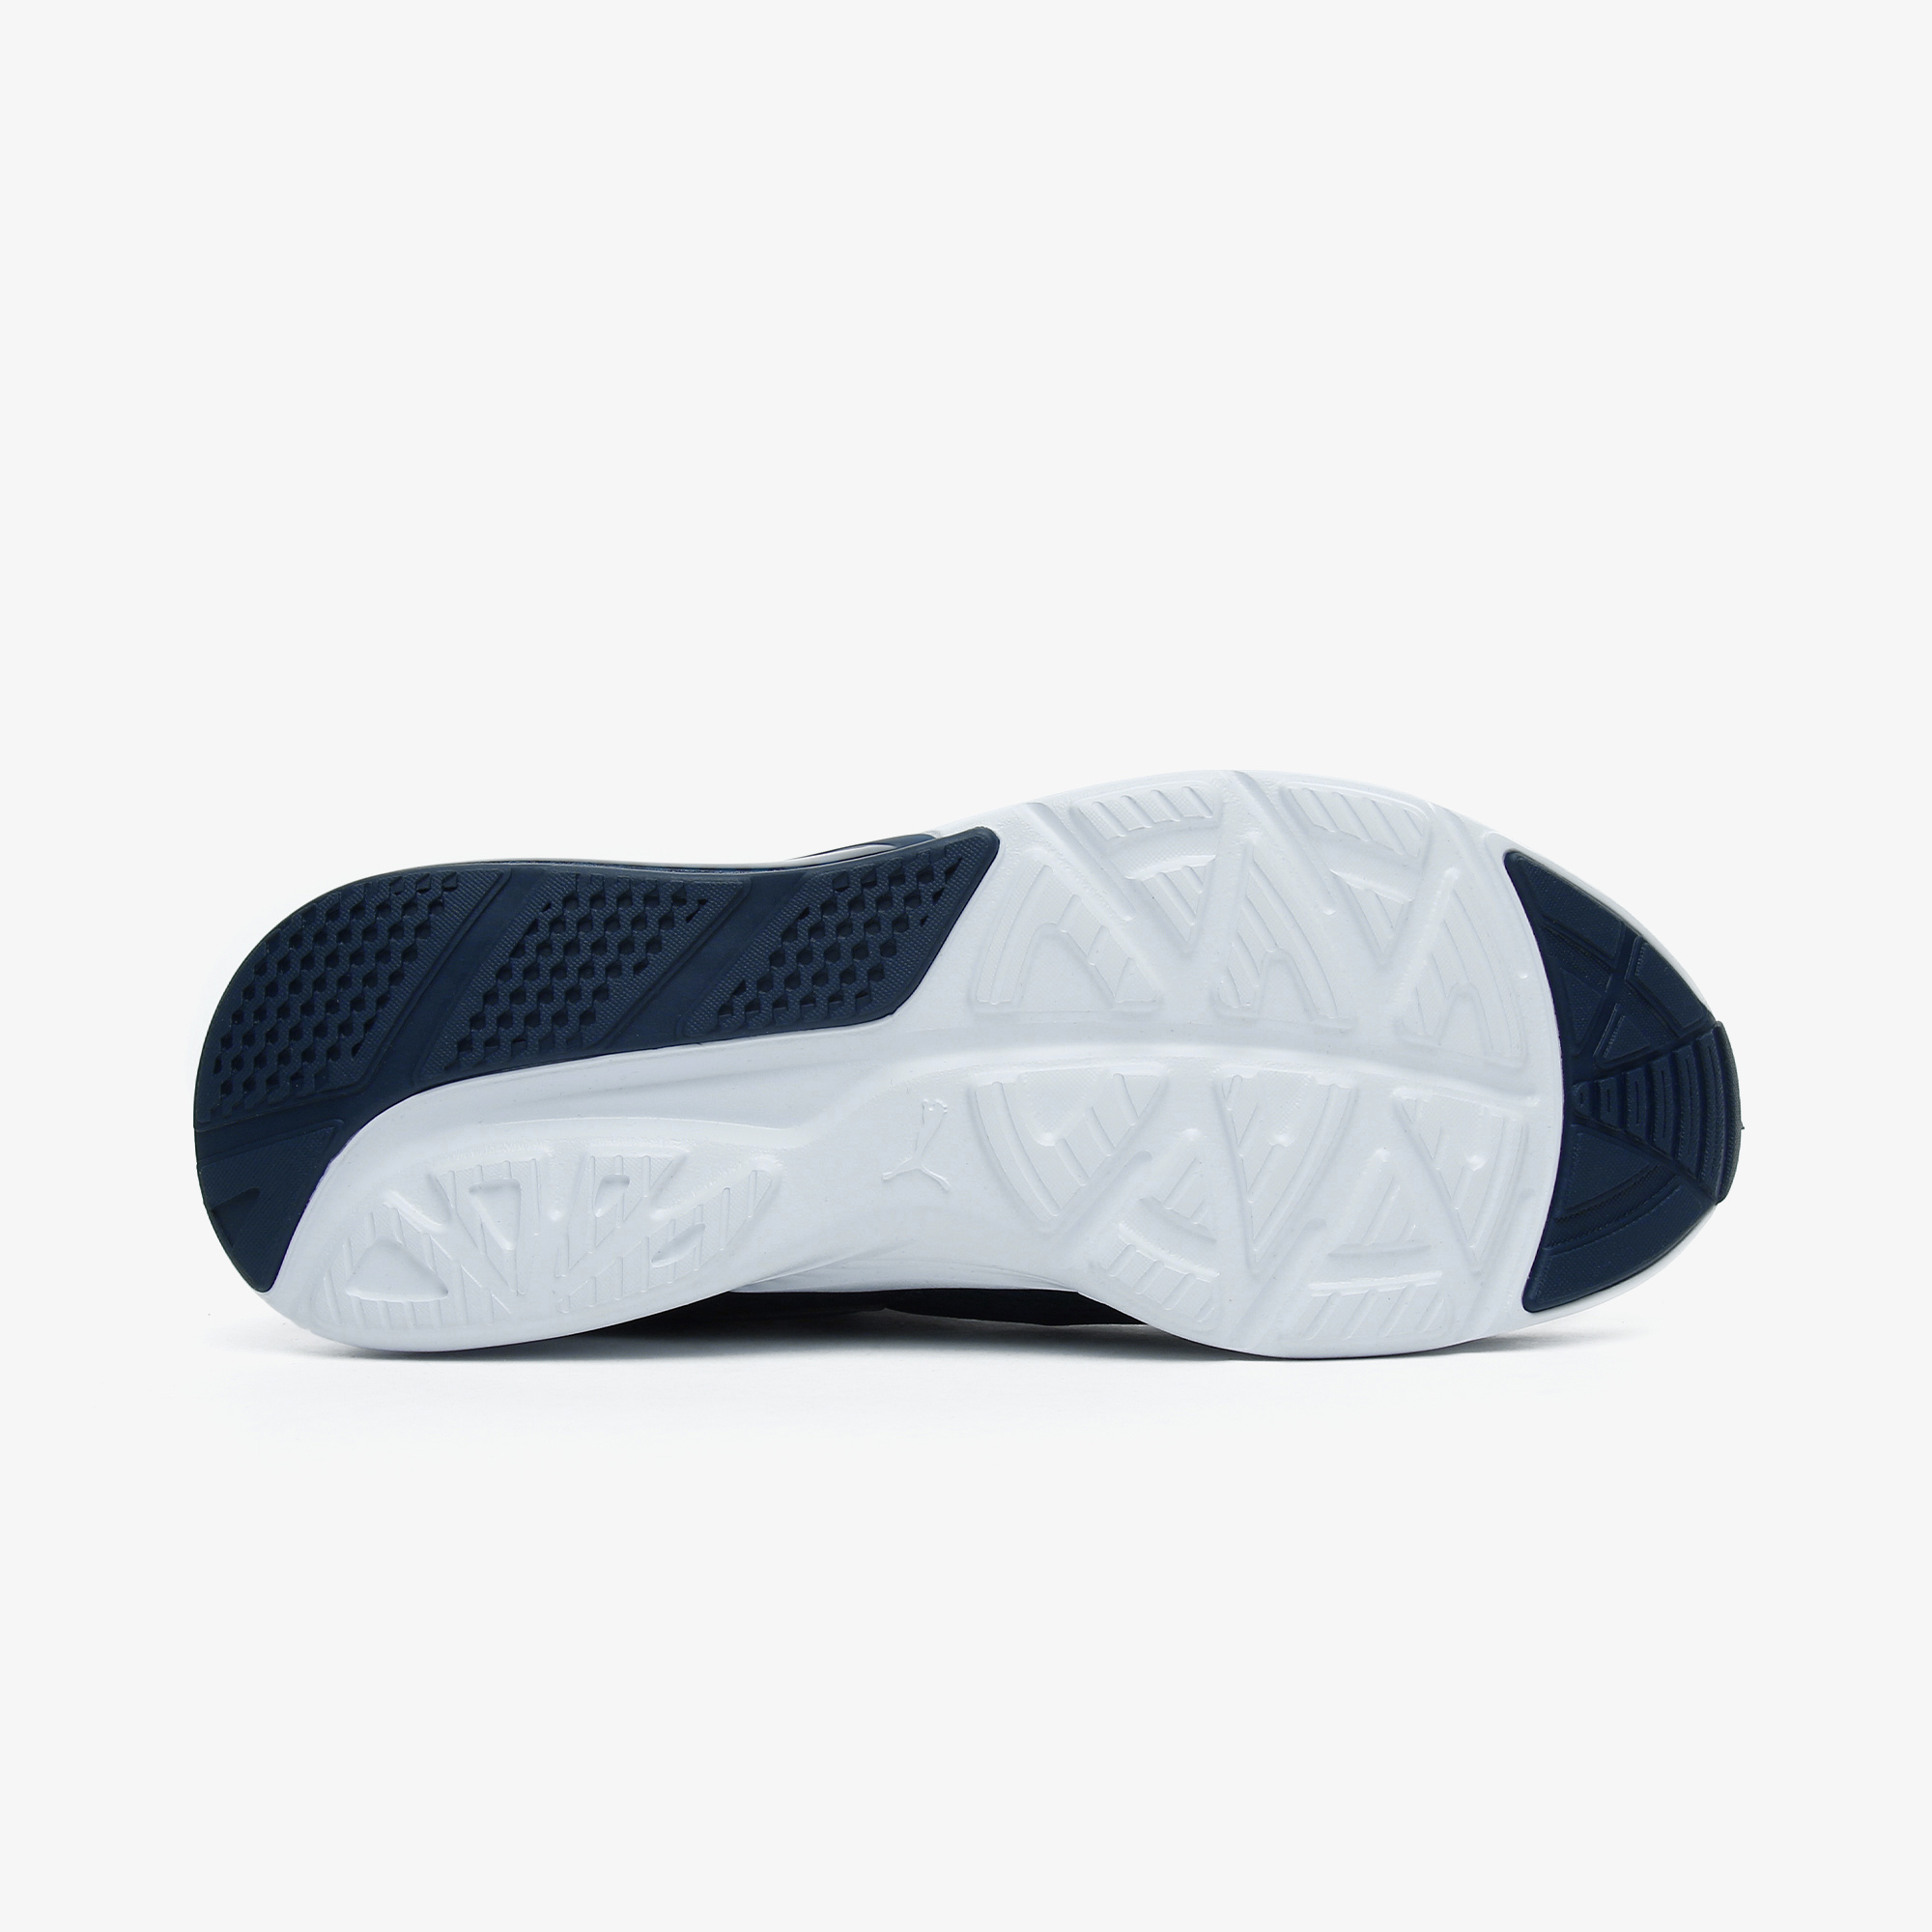 Puma Cell Vive Peacoat-High Risk Erkek Lacivert Spor Ayakkabı